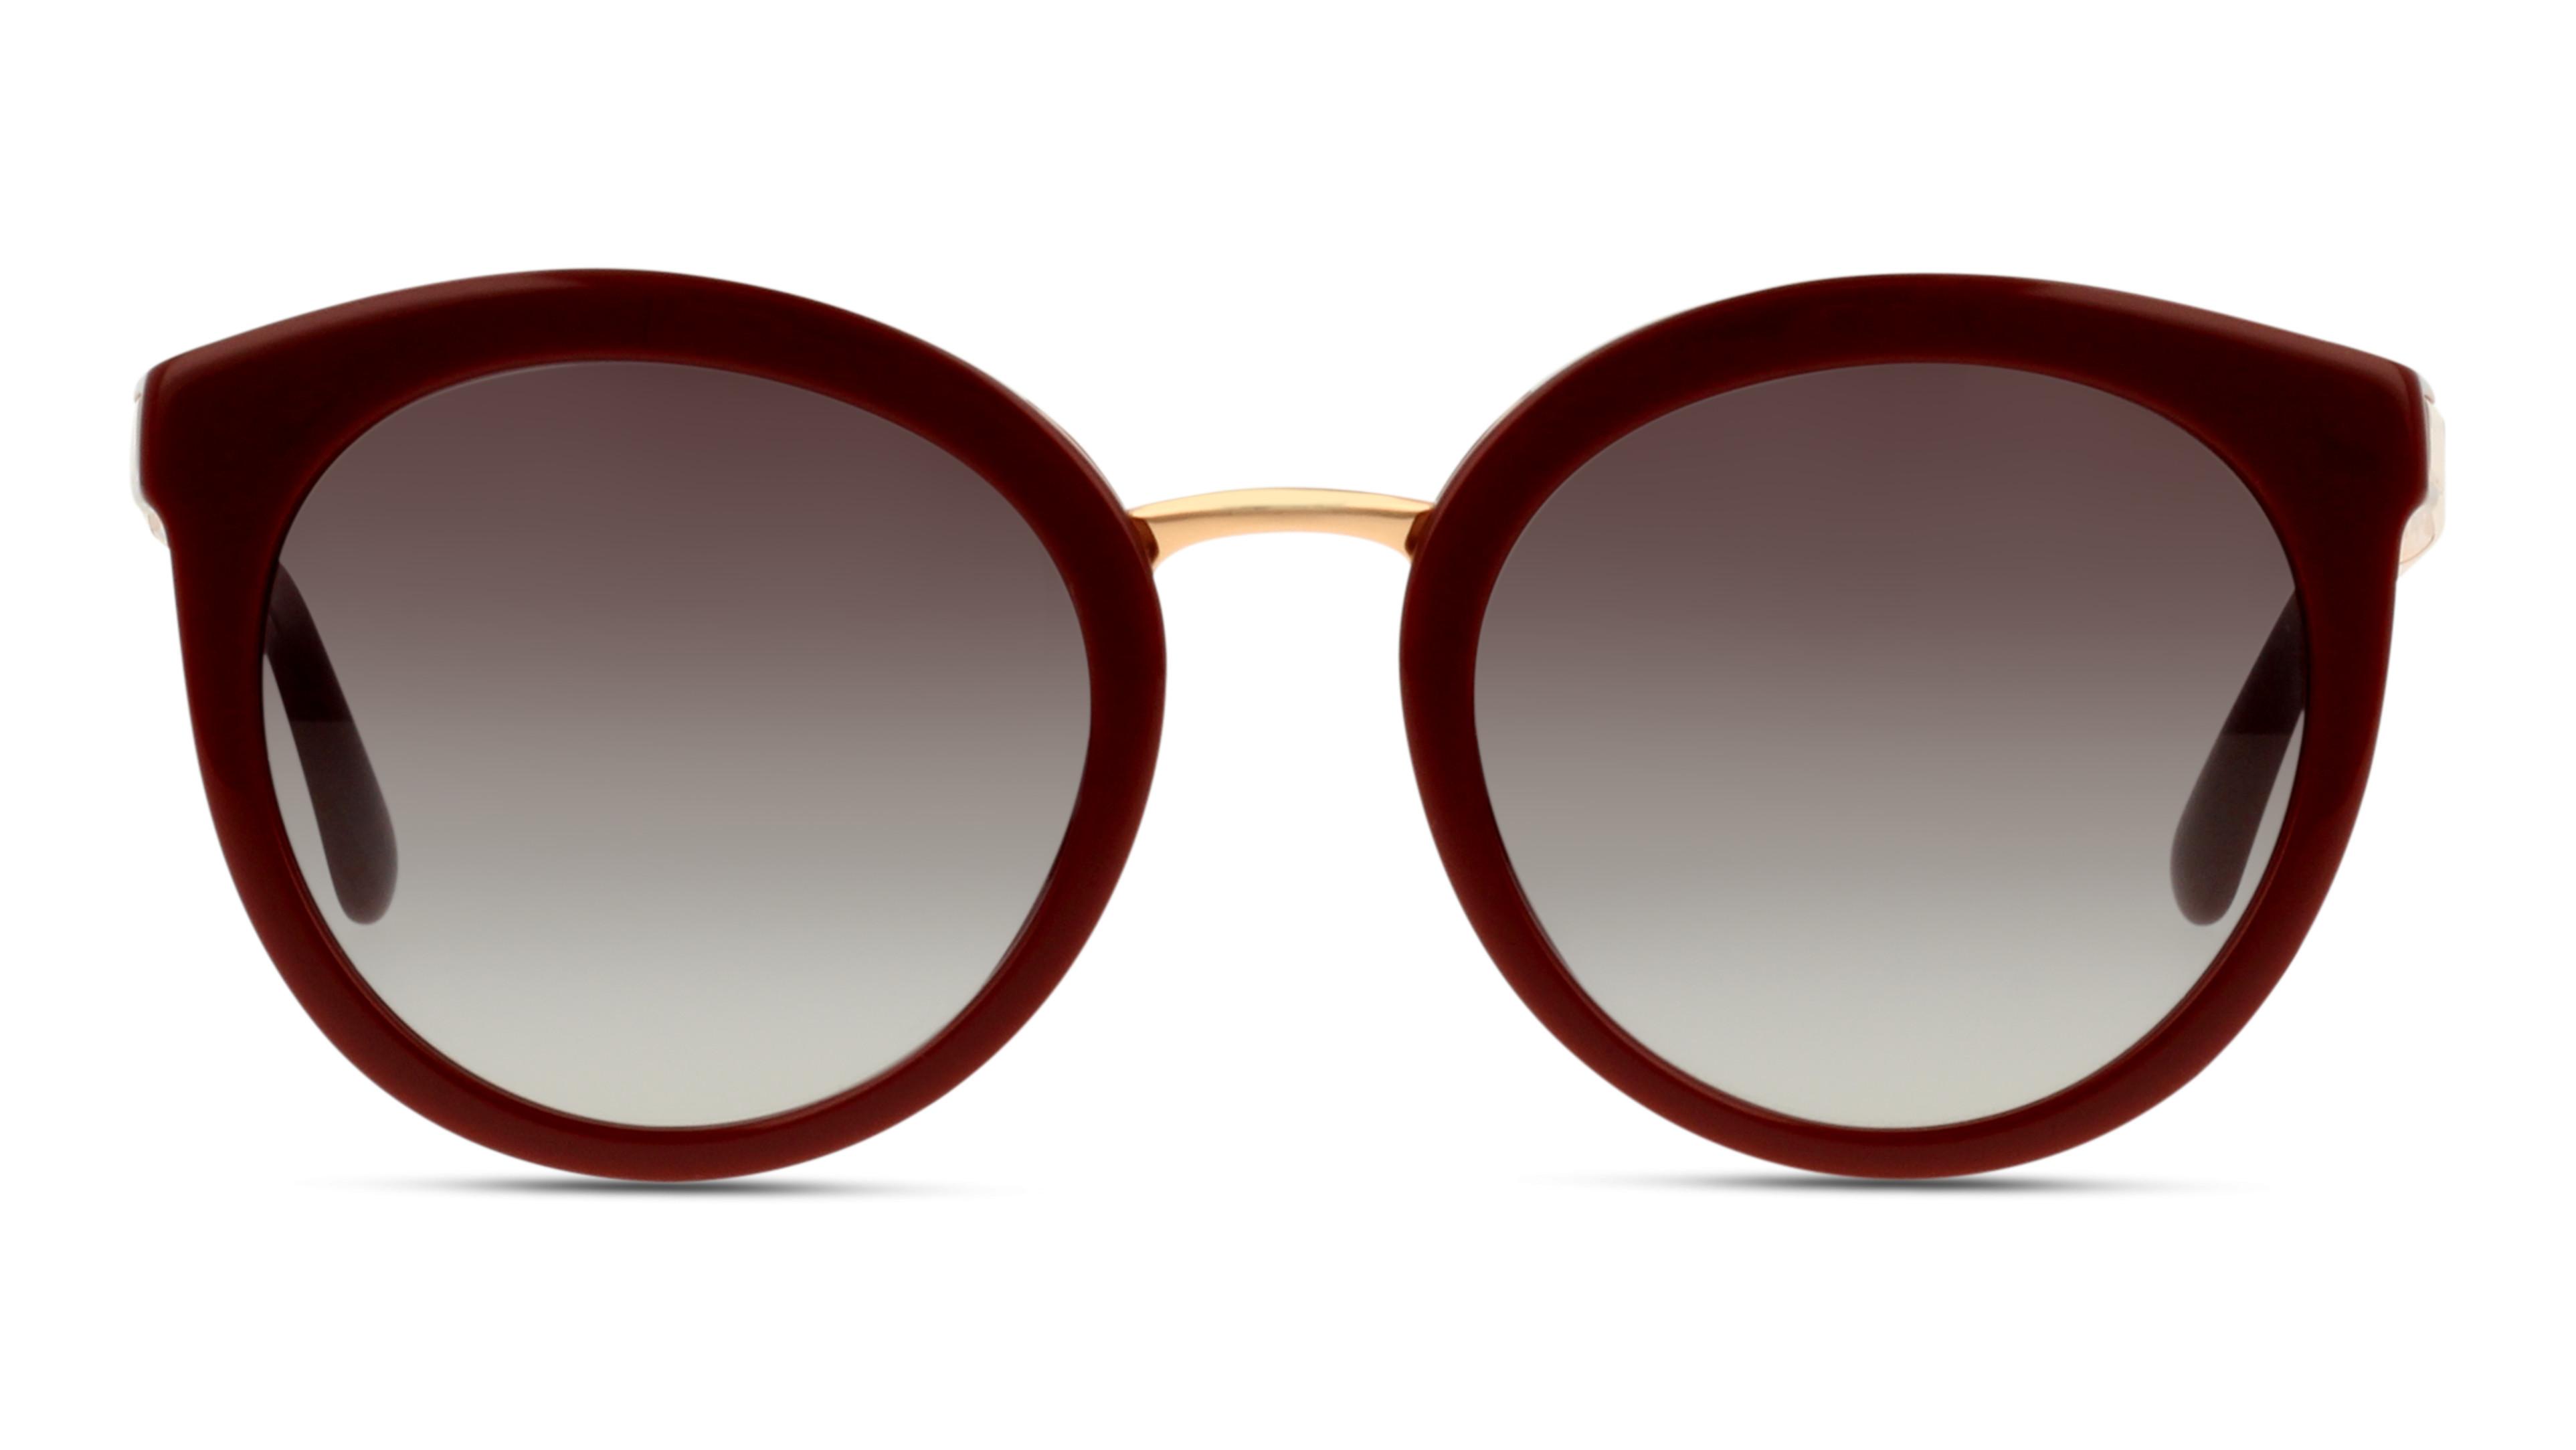 8053672956245-front-01-dolce-and-gabbana-dg4268-Eyewear-bordeaux